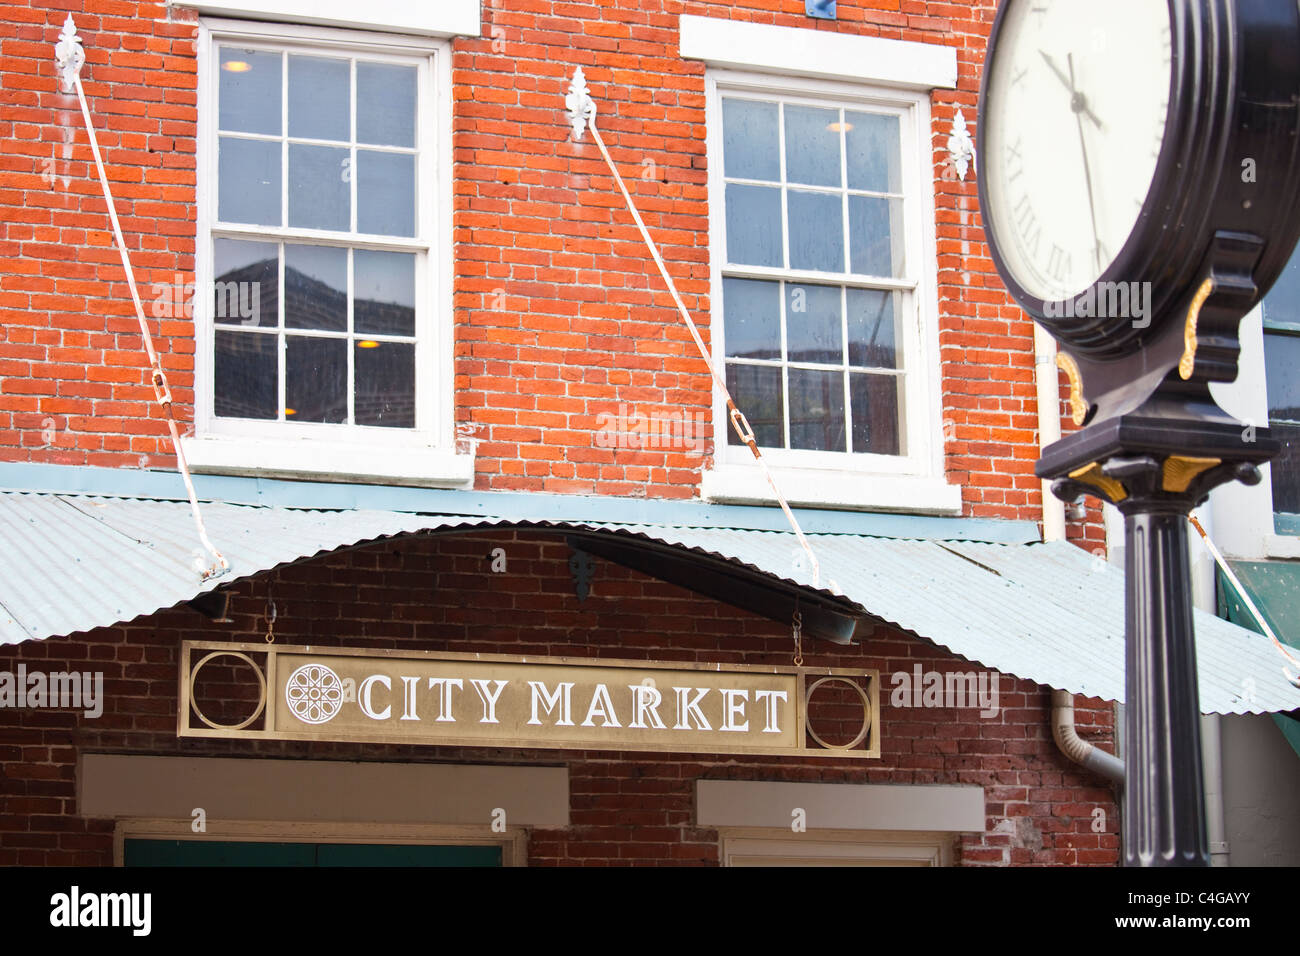 City Market, Savannah, Georgia - Stock Image